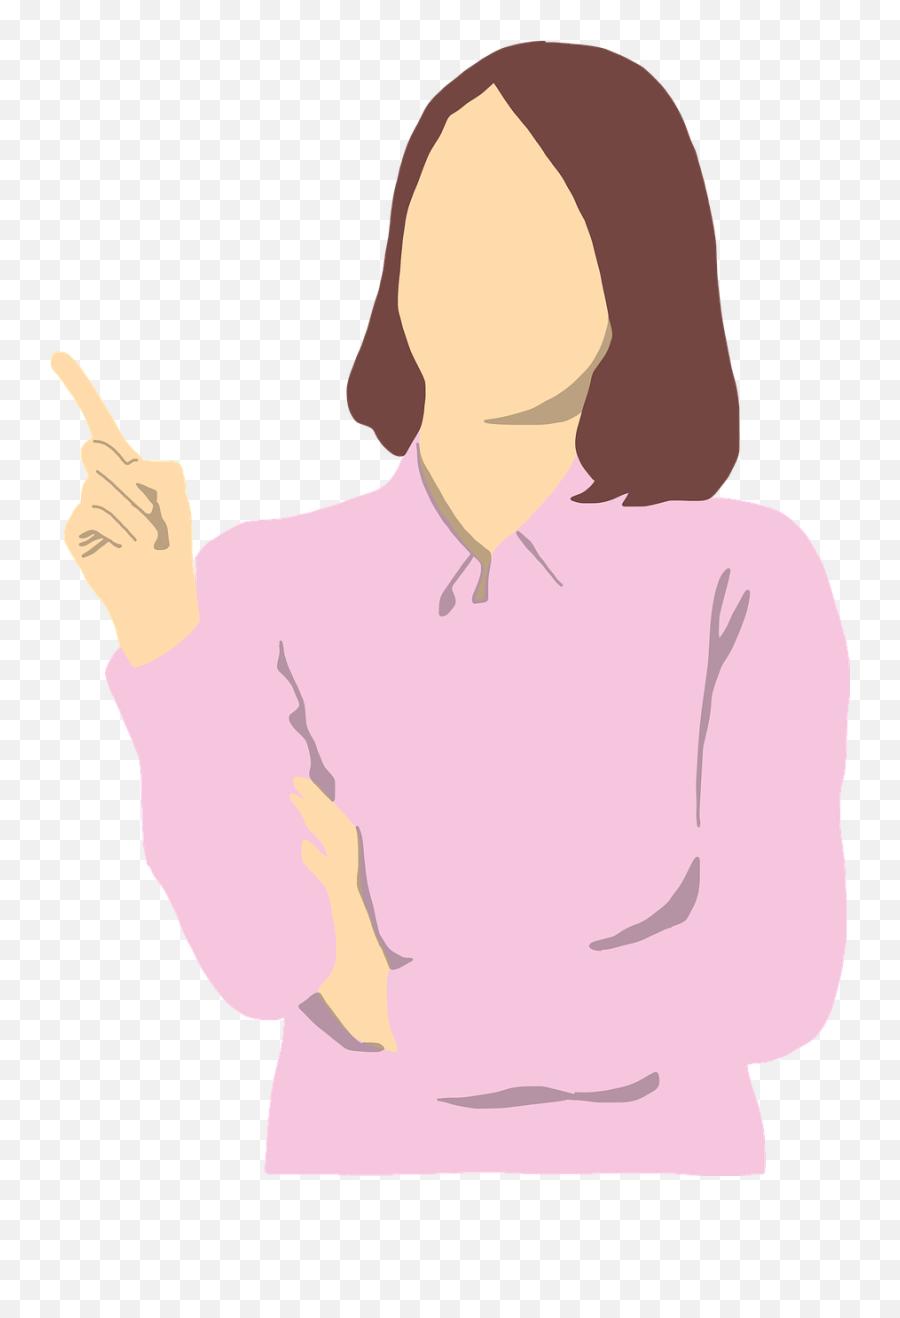 Orang Vector Png : orang, vector, Woman, Pointing, Vector, Graphic, Pixabay, Gambar, Orang, Menunjuk, Transparent, Images, Pngaaa.com